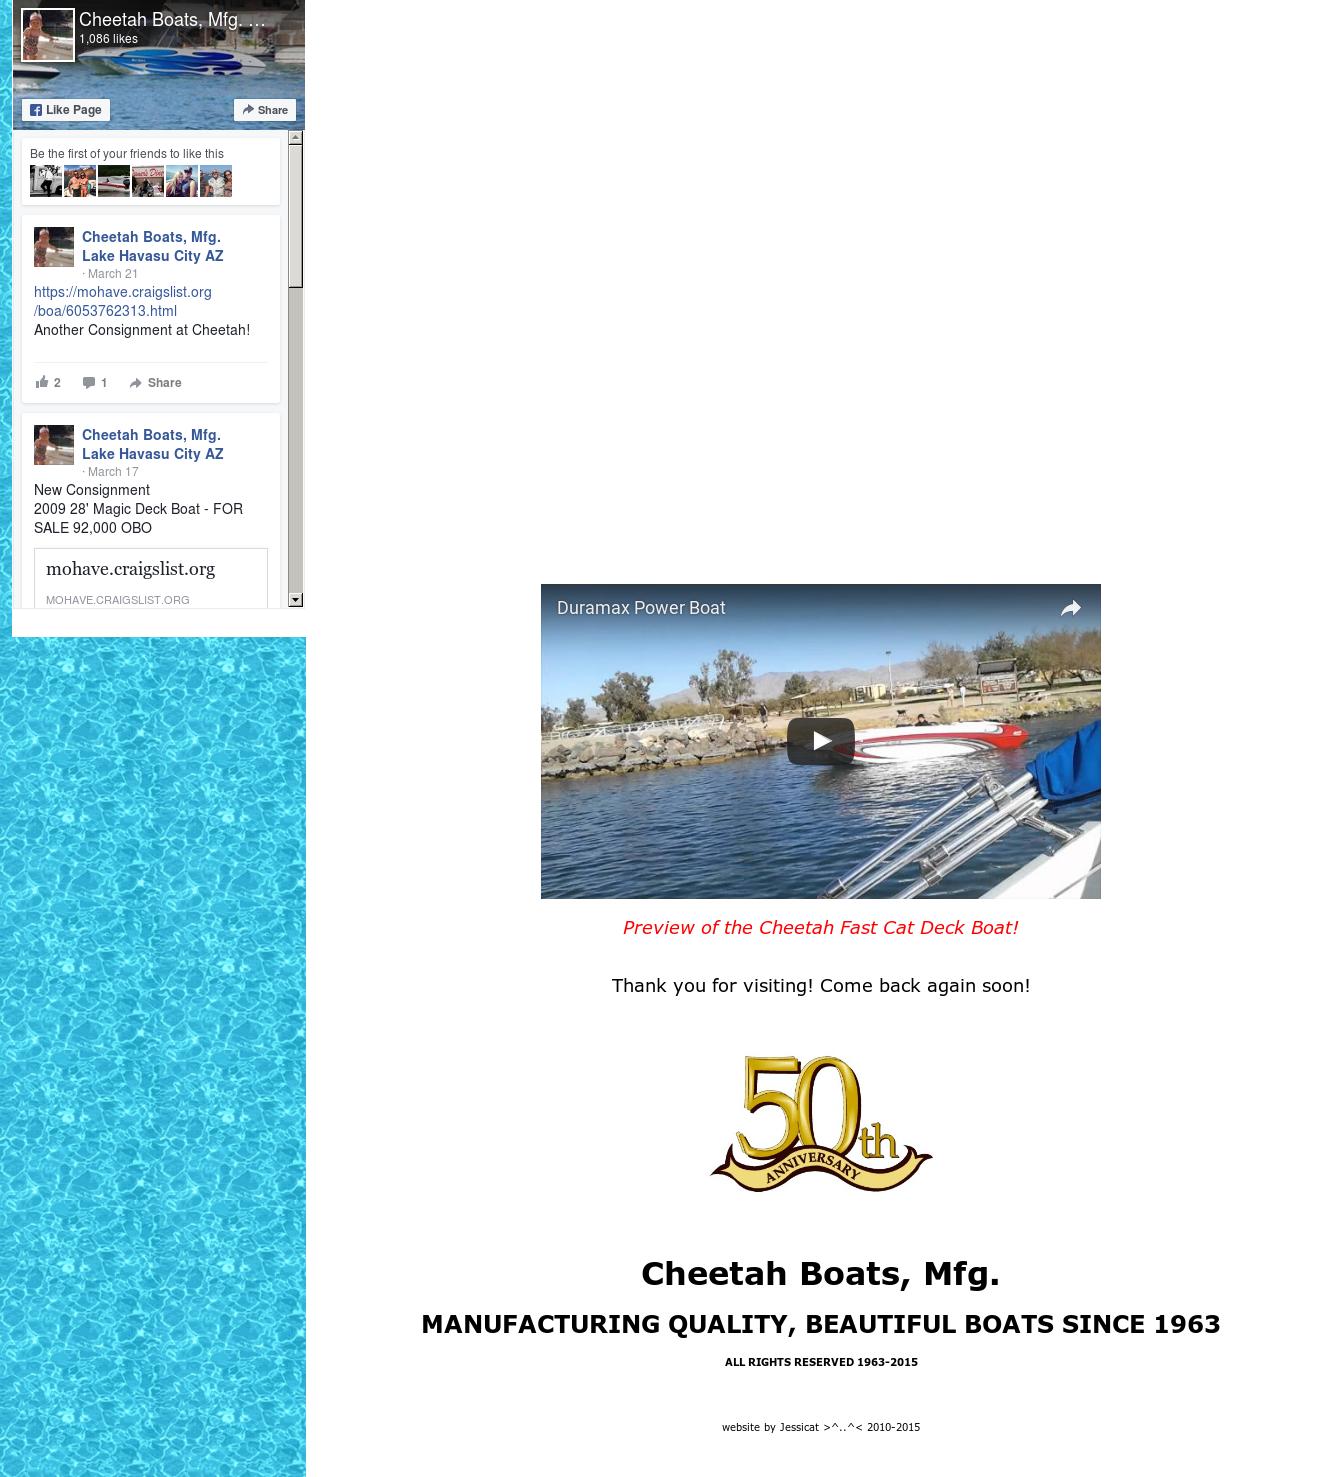 Cheetah Boats, Mfg  Lake Havasu City Az Competitors, Revenue and